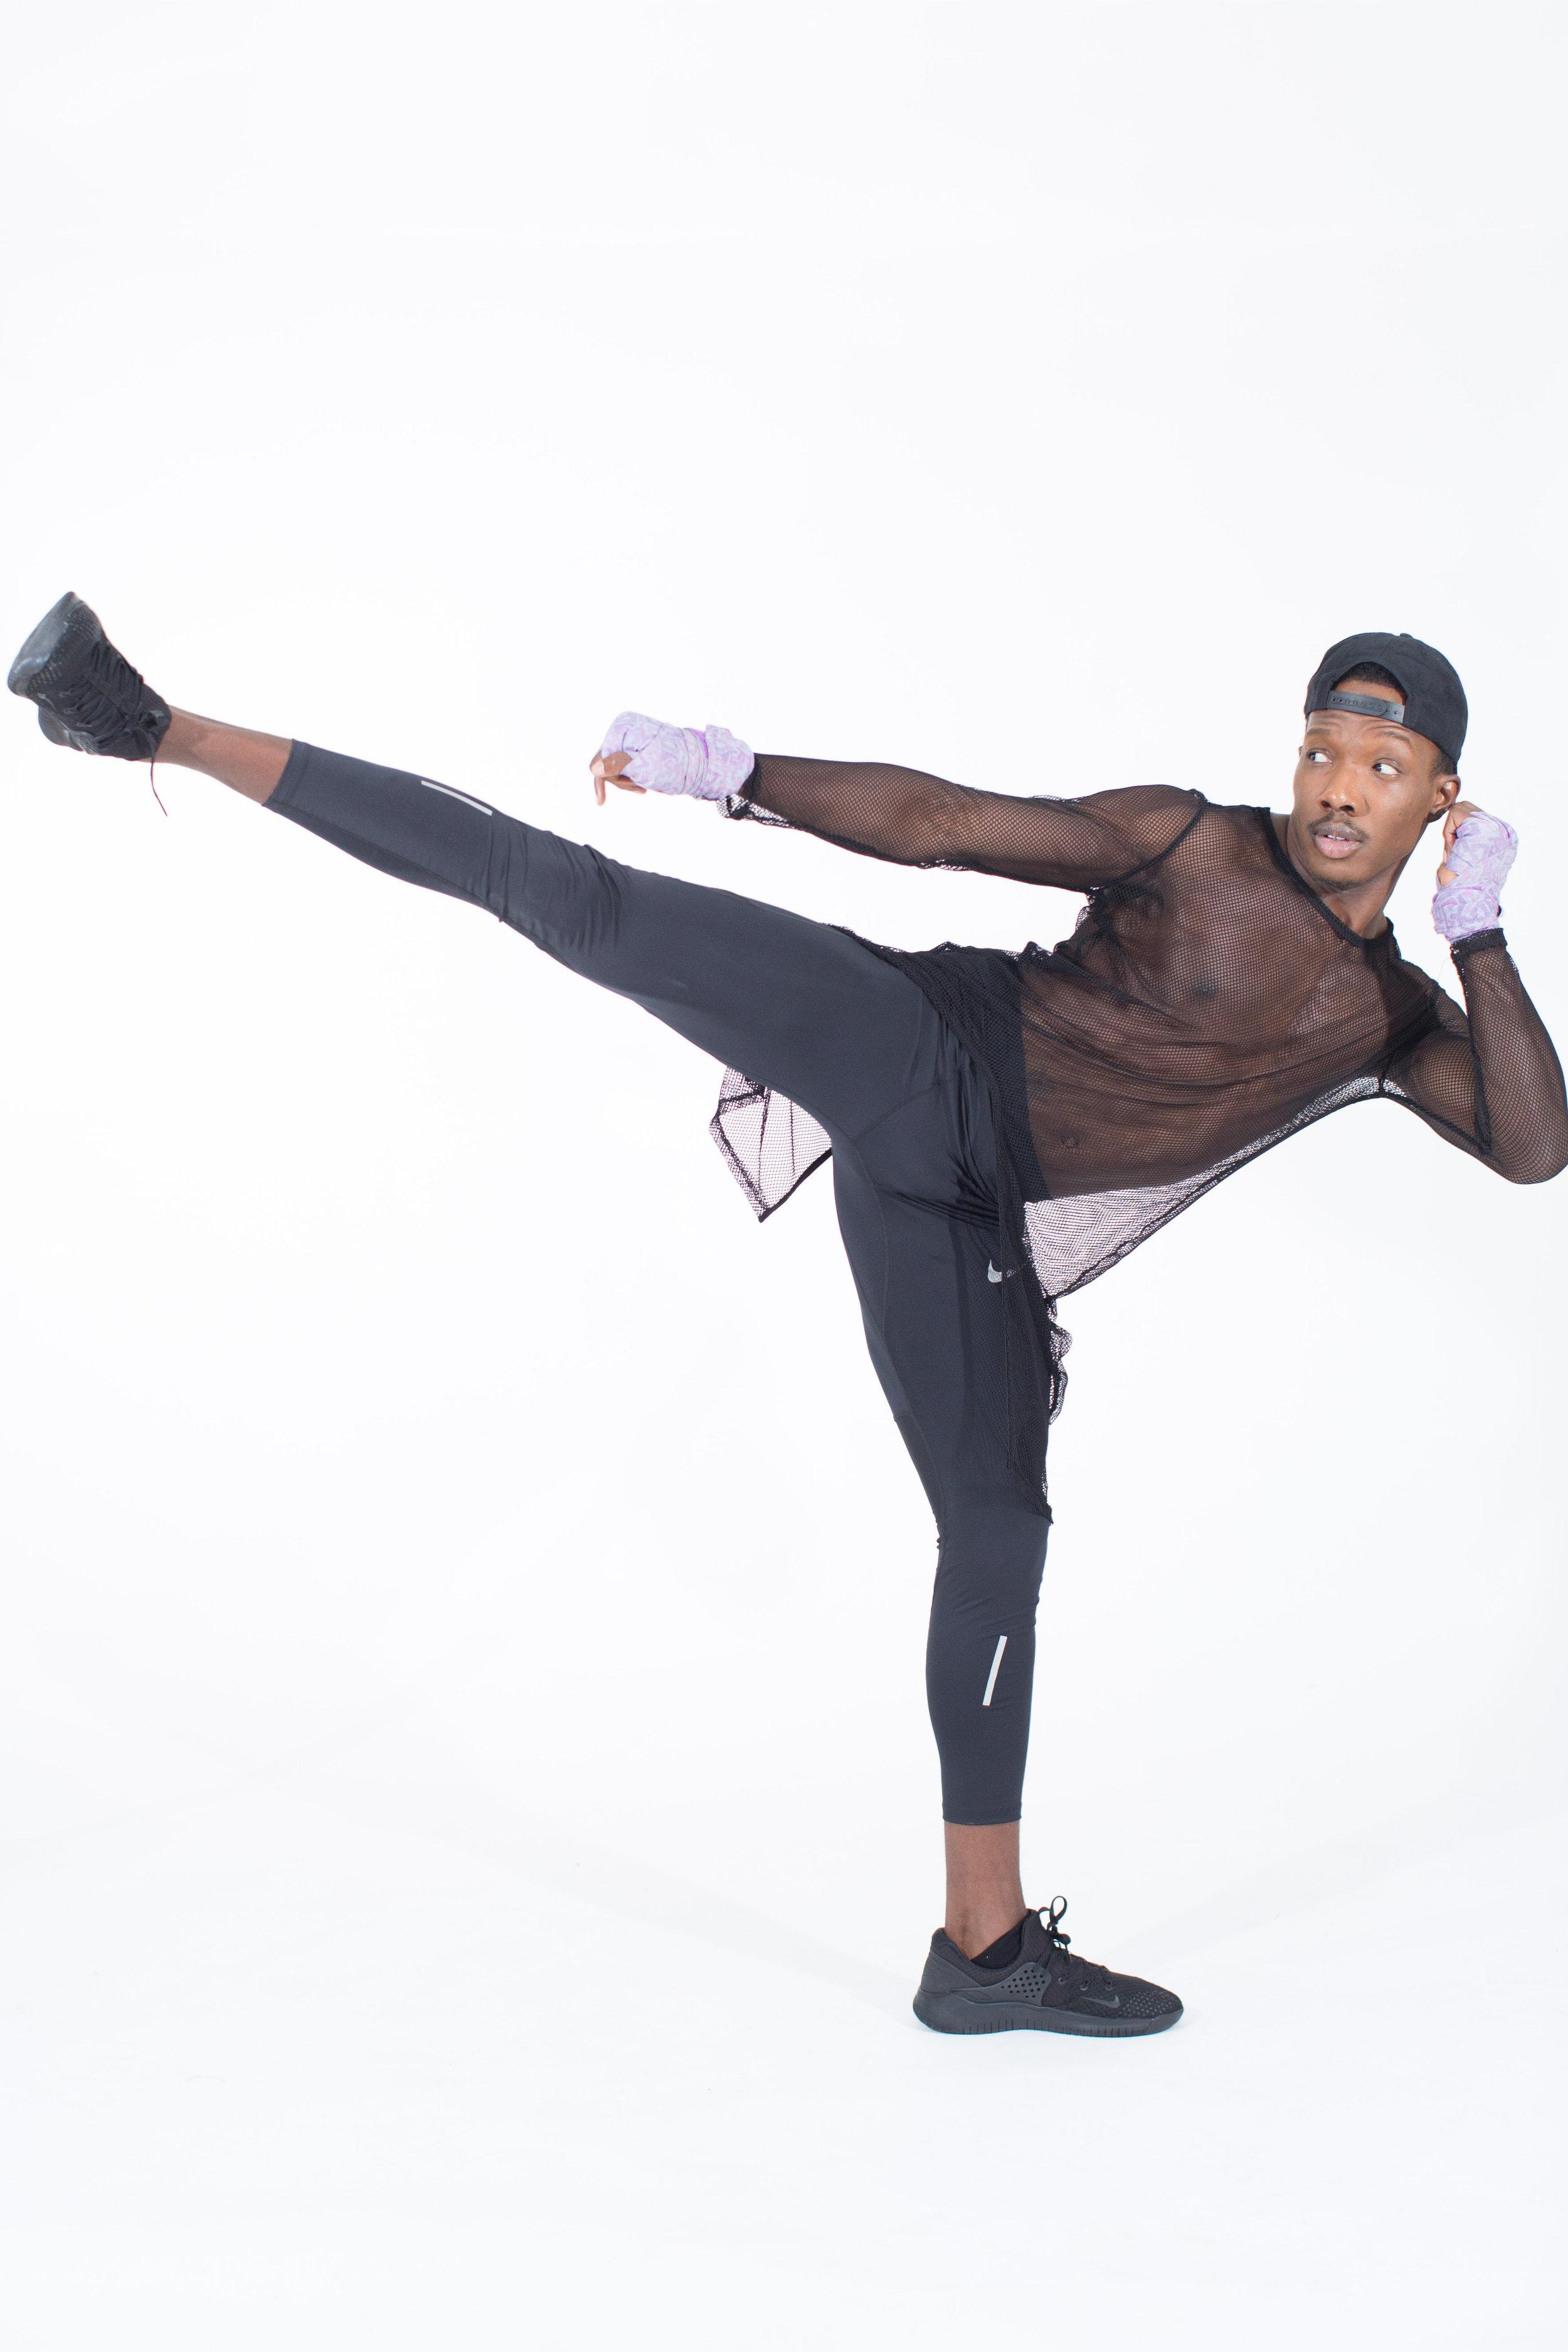 305 Fitness instructor_Shaun 2.jpg